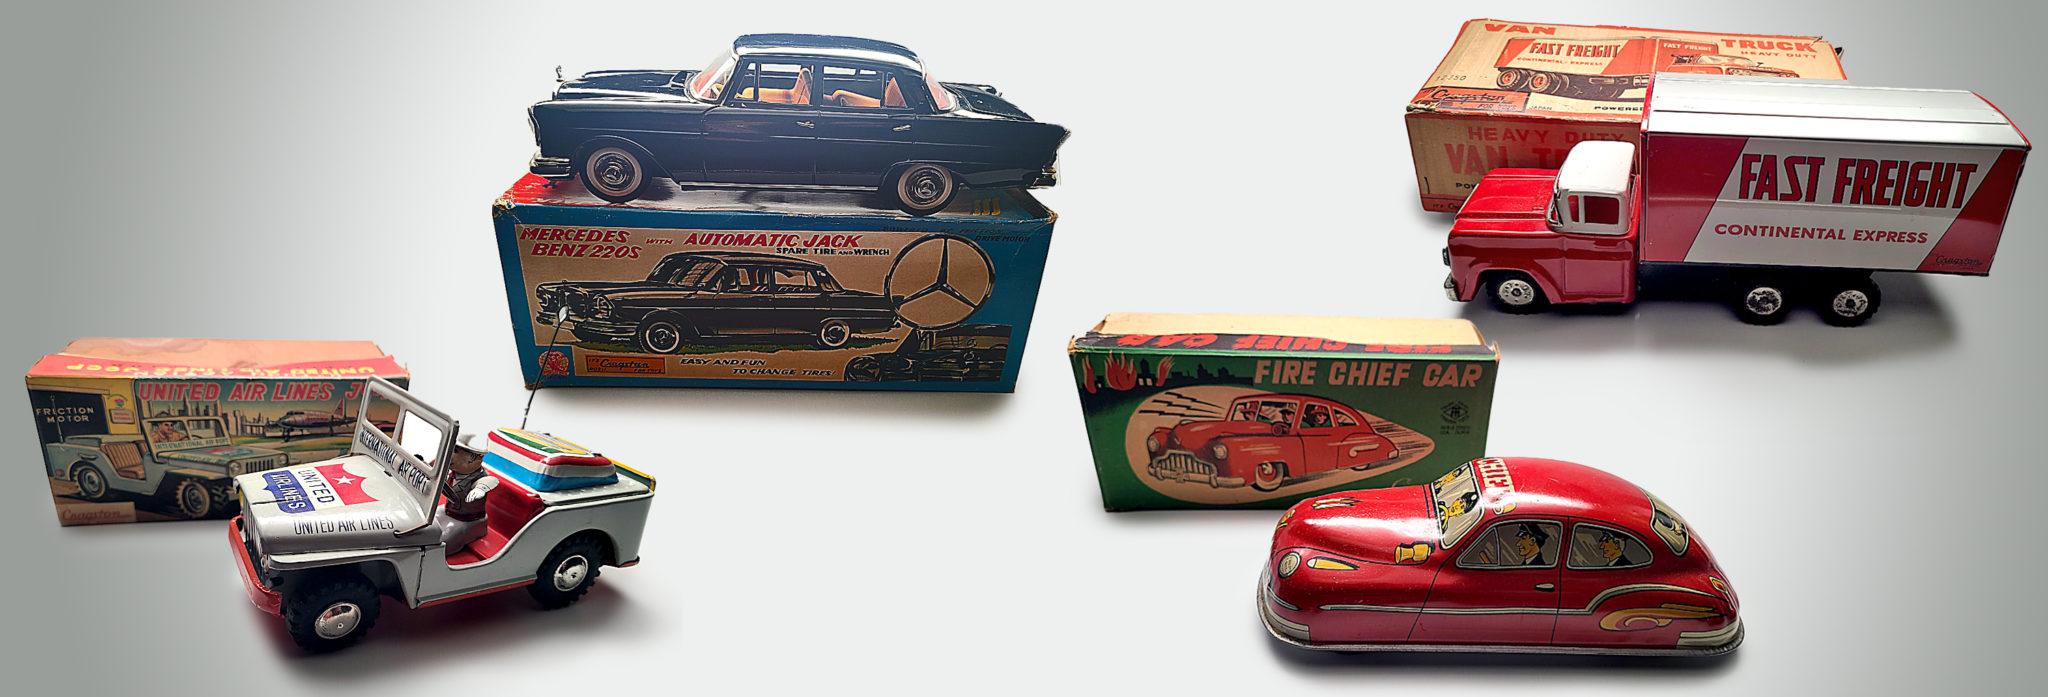 Milenio Stadium - Cragstan toy collection